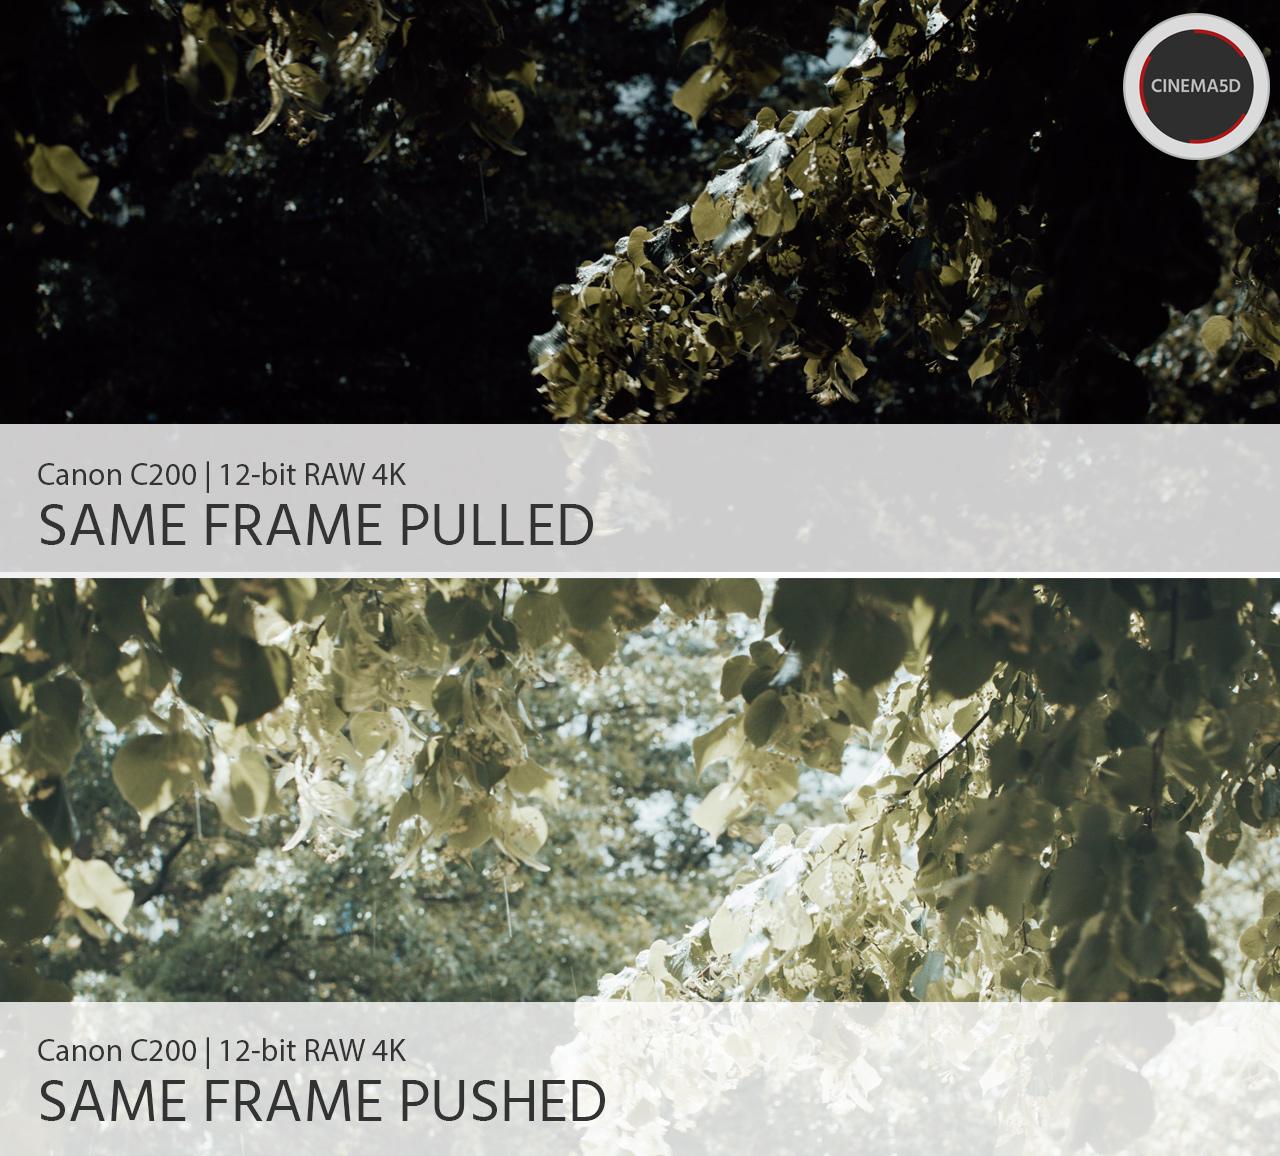 Canon C200 Review - Impressive RAW Footage & Ergonomics For Little